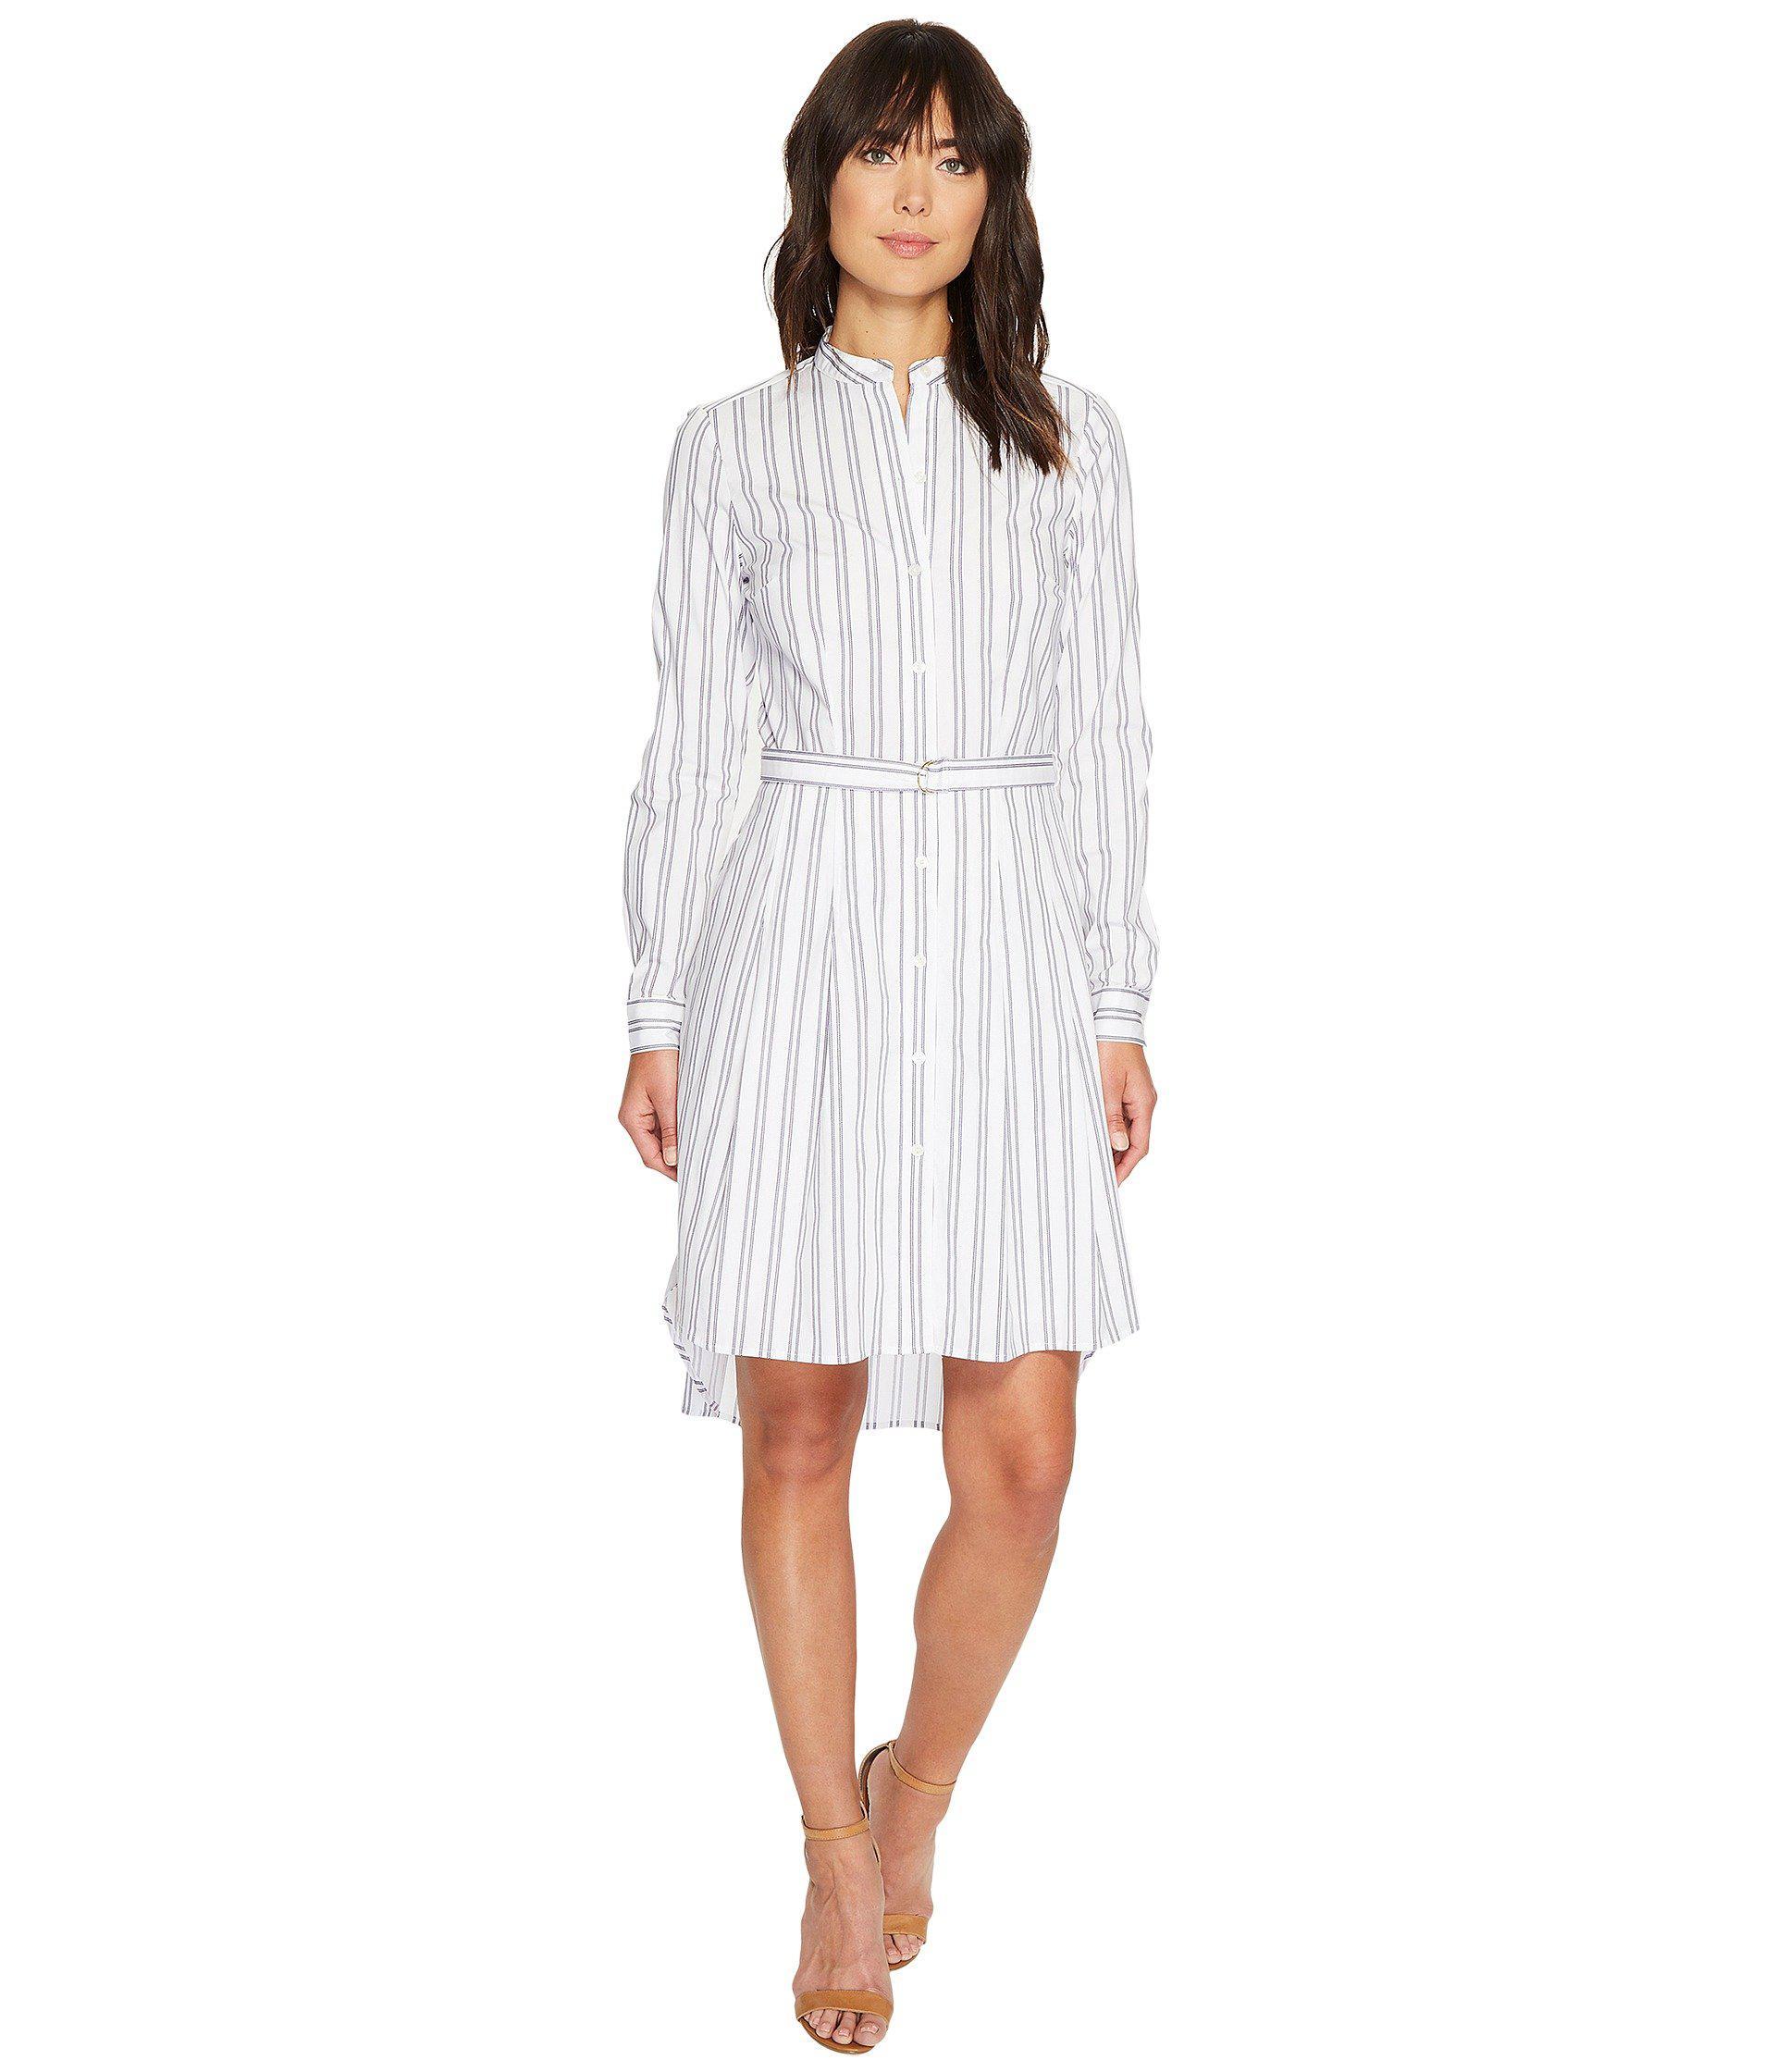 dff65f54d40 Lyst - MICHAEL Michael Kors Bengal Stripe High-low Dress in White